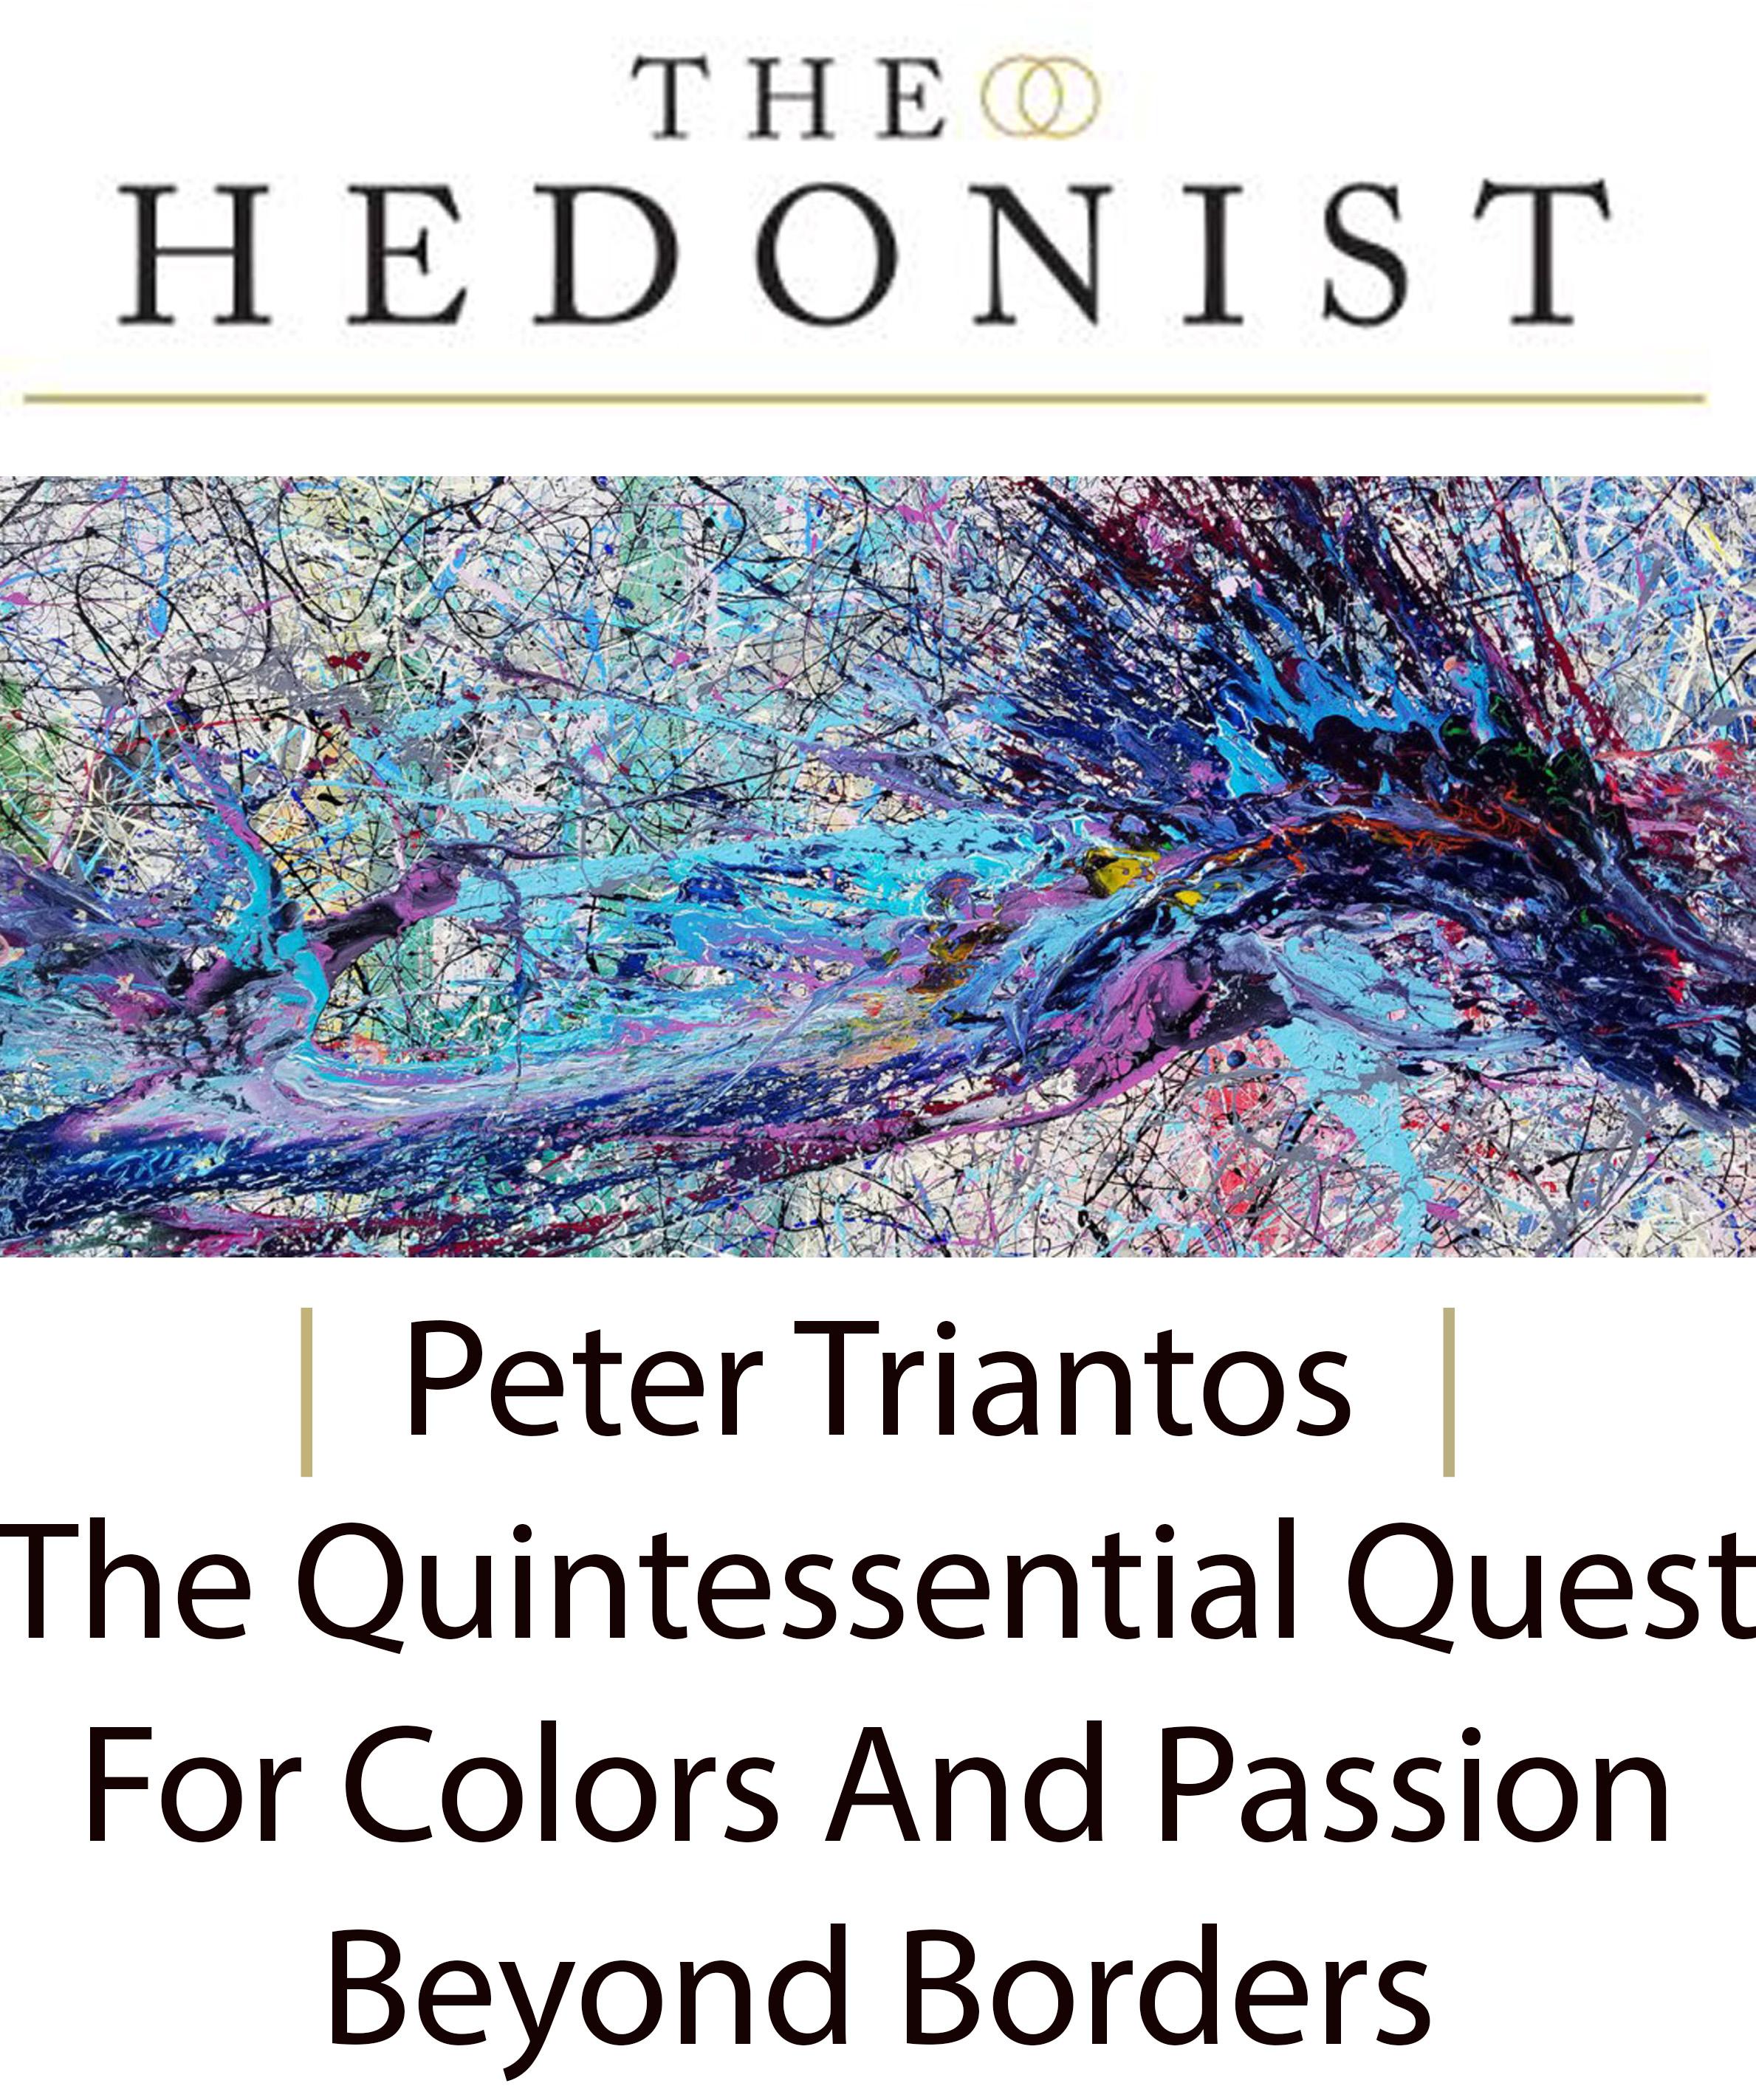 The Hedonist Magazine - July 2018